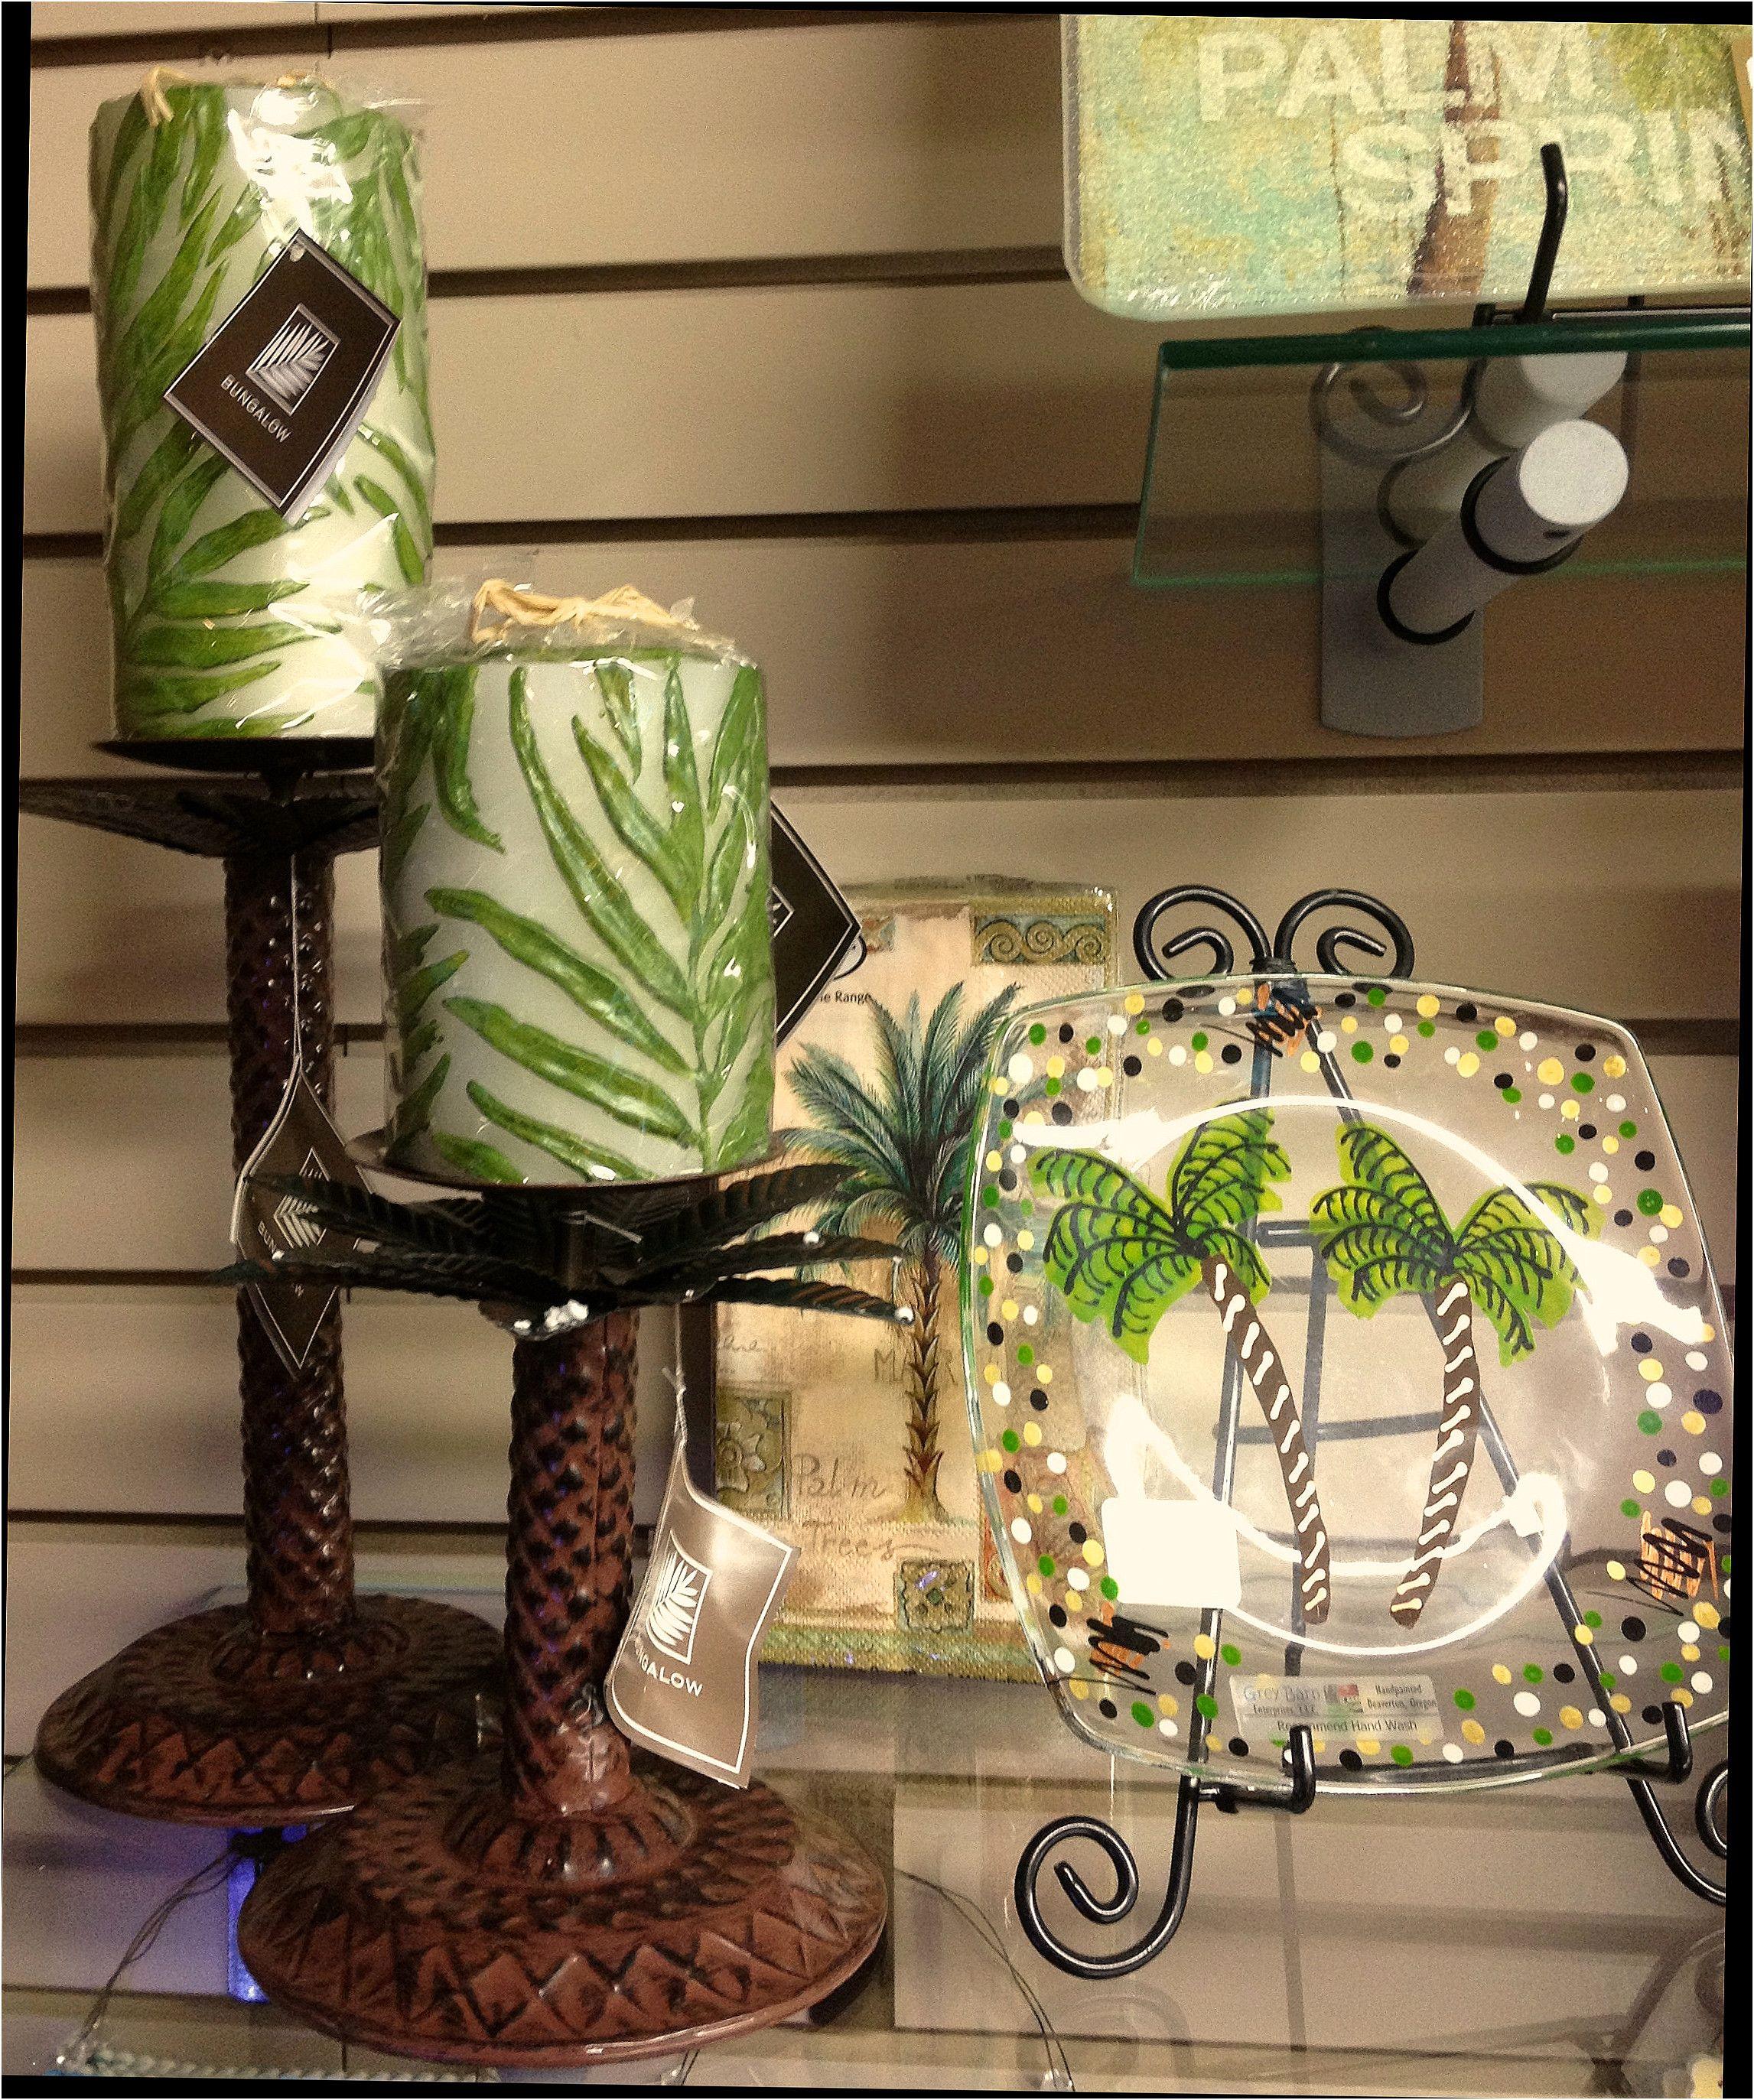 Best Of Decorating Bathroom Palm Tree theme di 2020